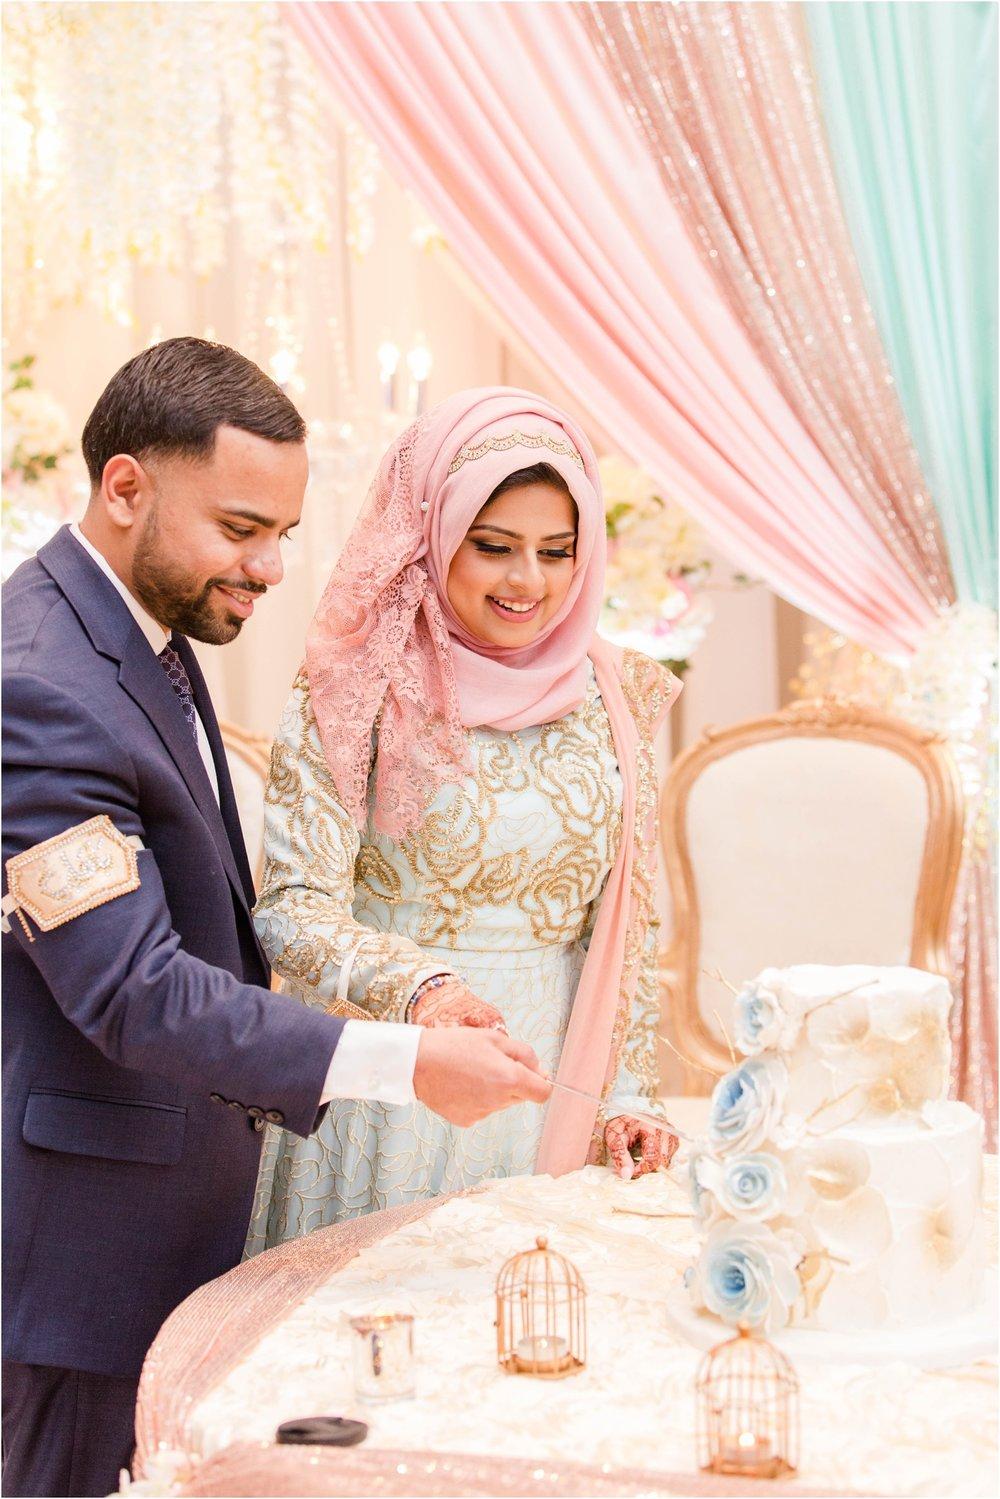 Best-of-2017-Weddings-Toronto-Mississauga-Brampton-Scarborough-GTA-Pakistani-Indian-Wedding-Engagement-Photographer-Photography_0022.jpg